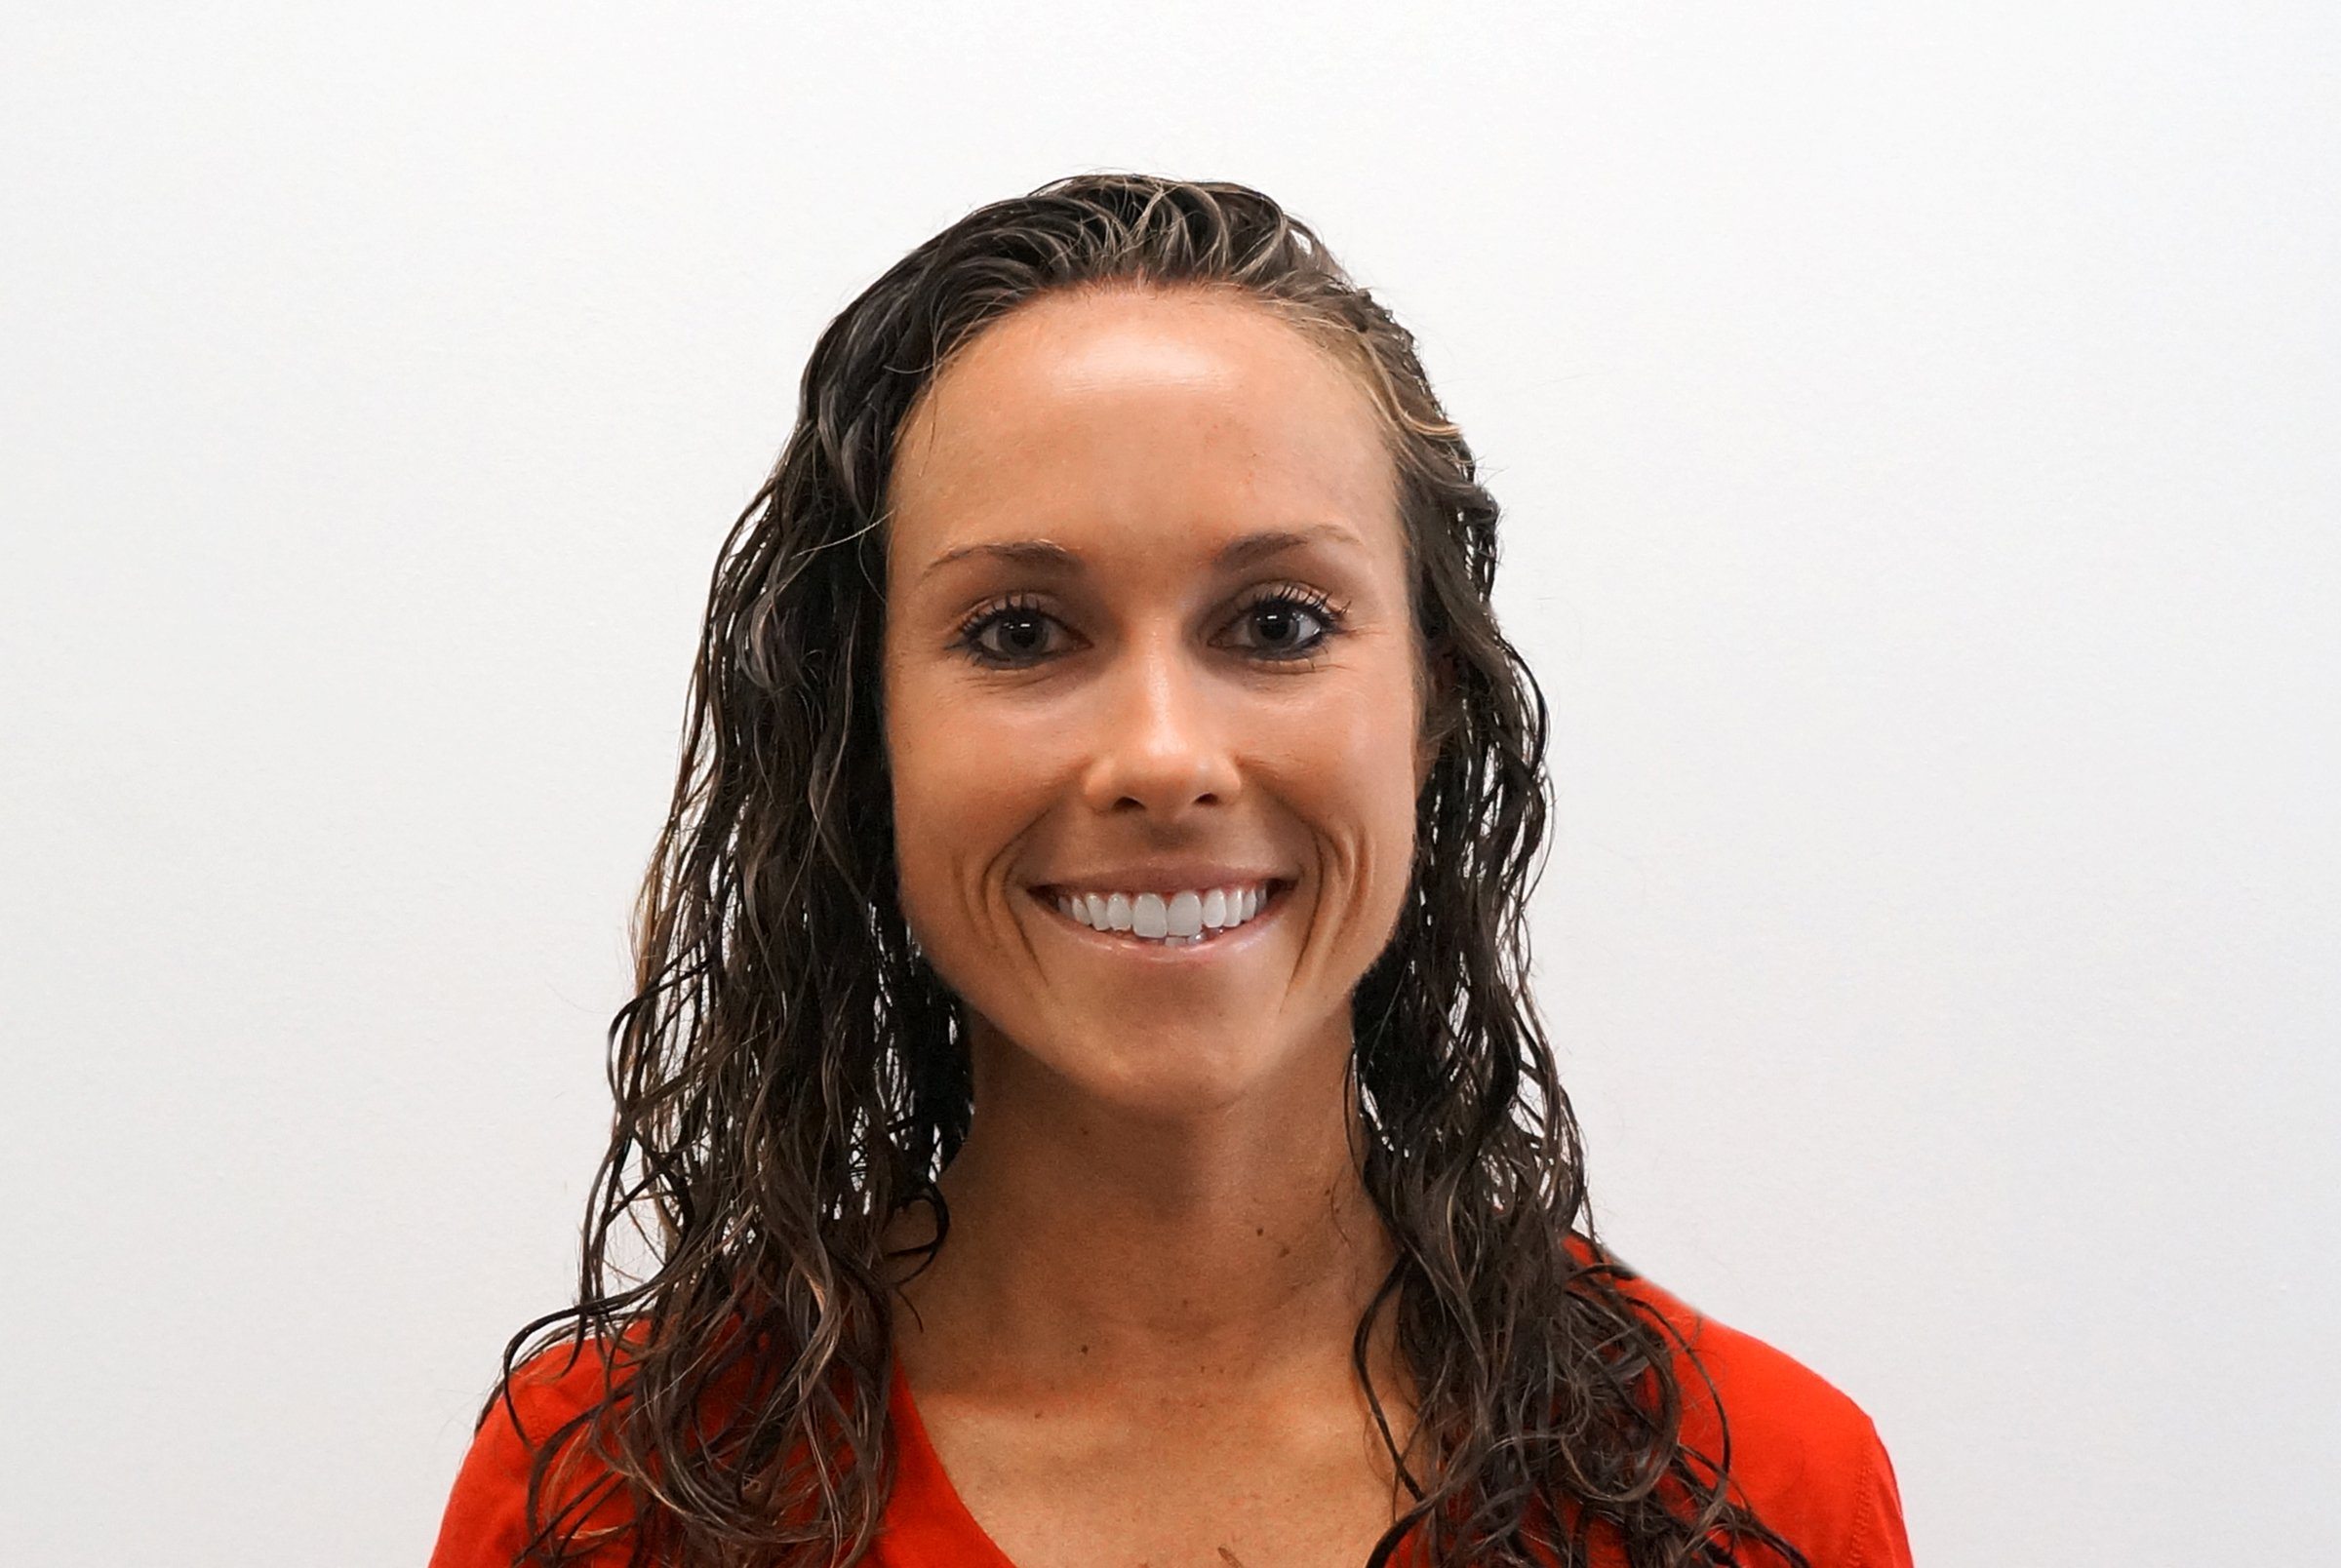 Stephanie Funderburk